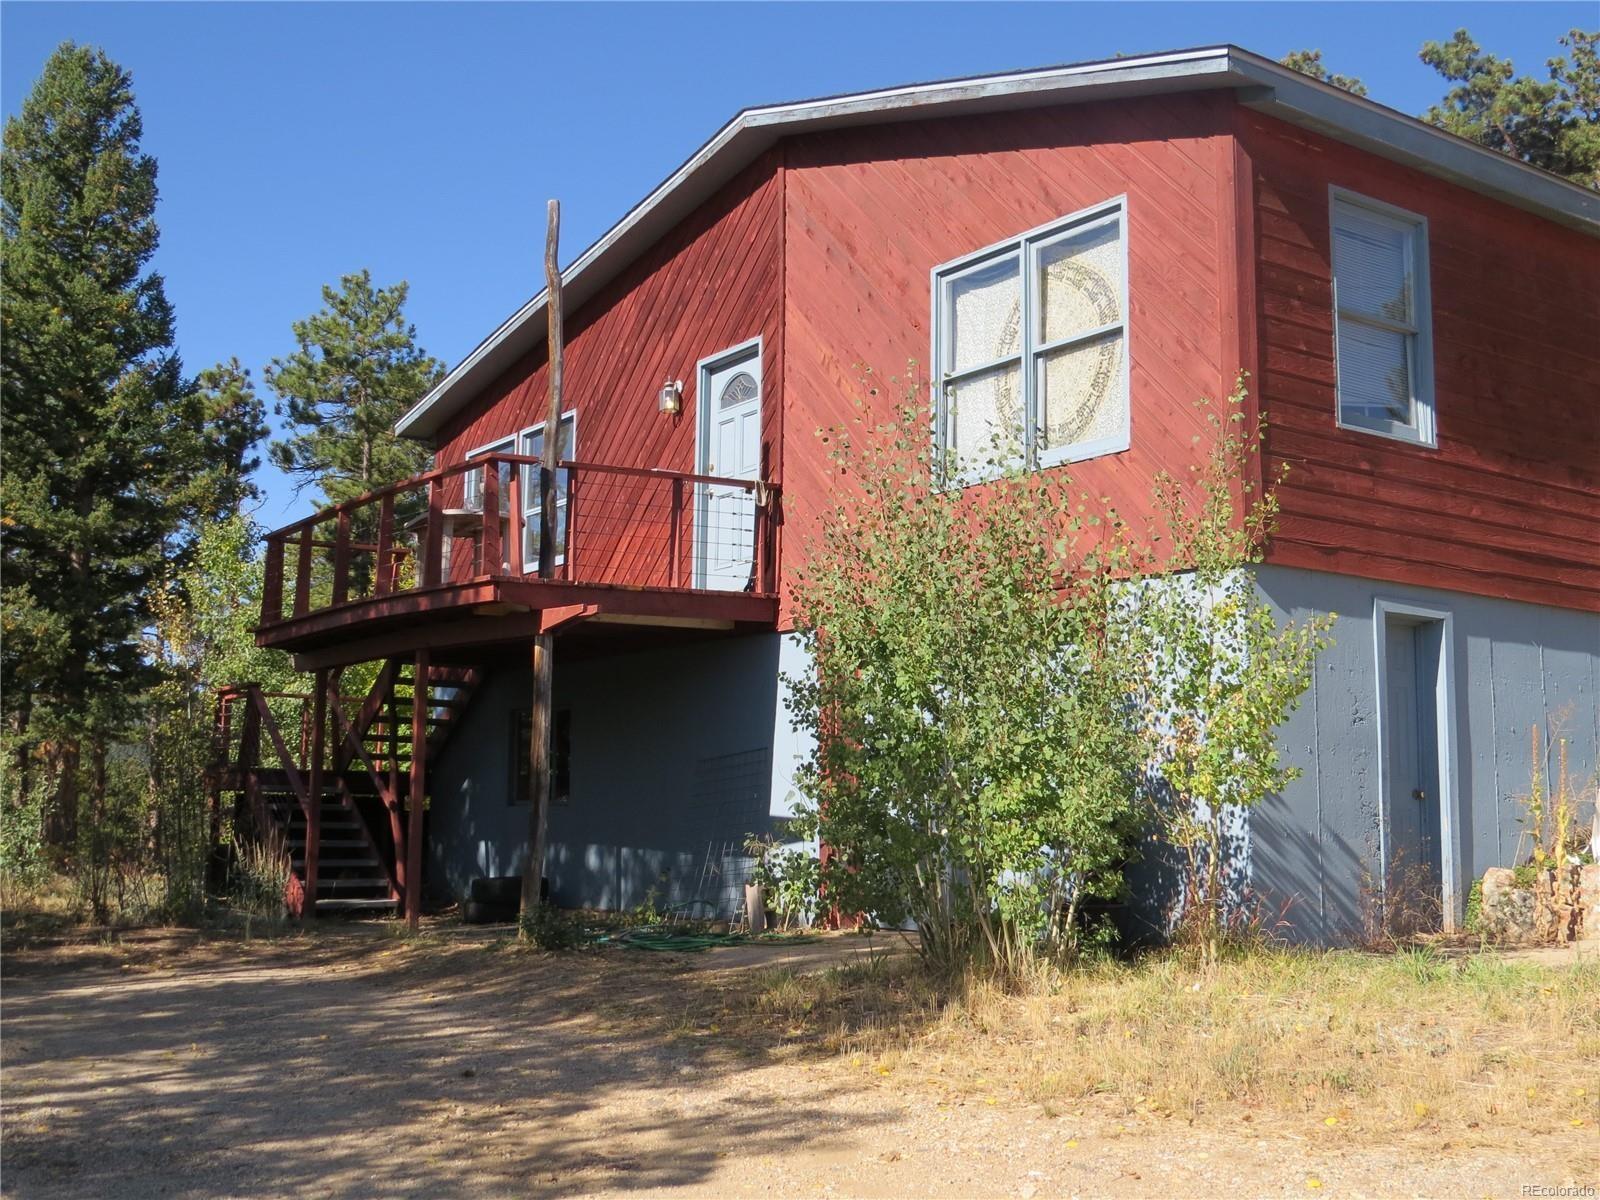 MLS# 9251839 - 1 - 50 Navajo Trail, Nederland, CO 80466